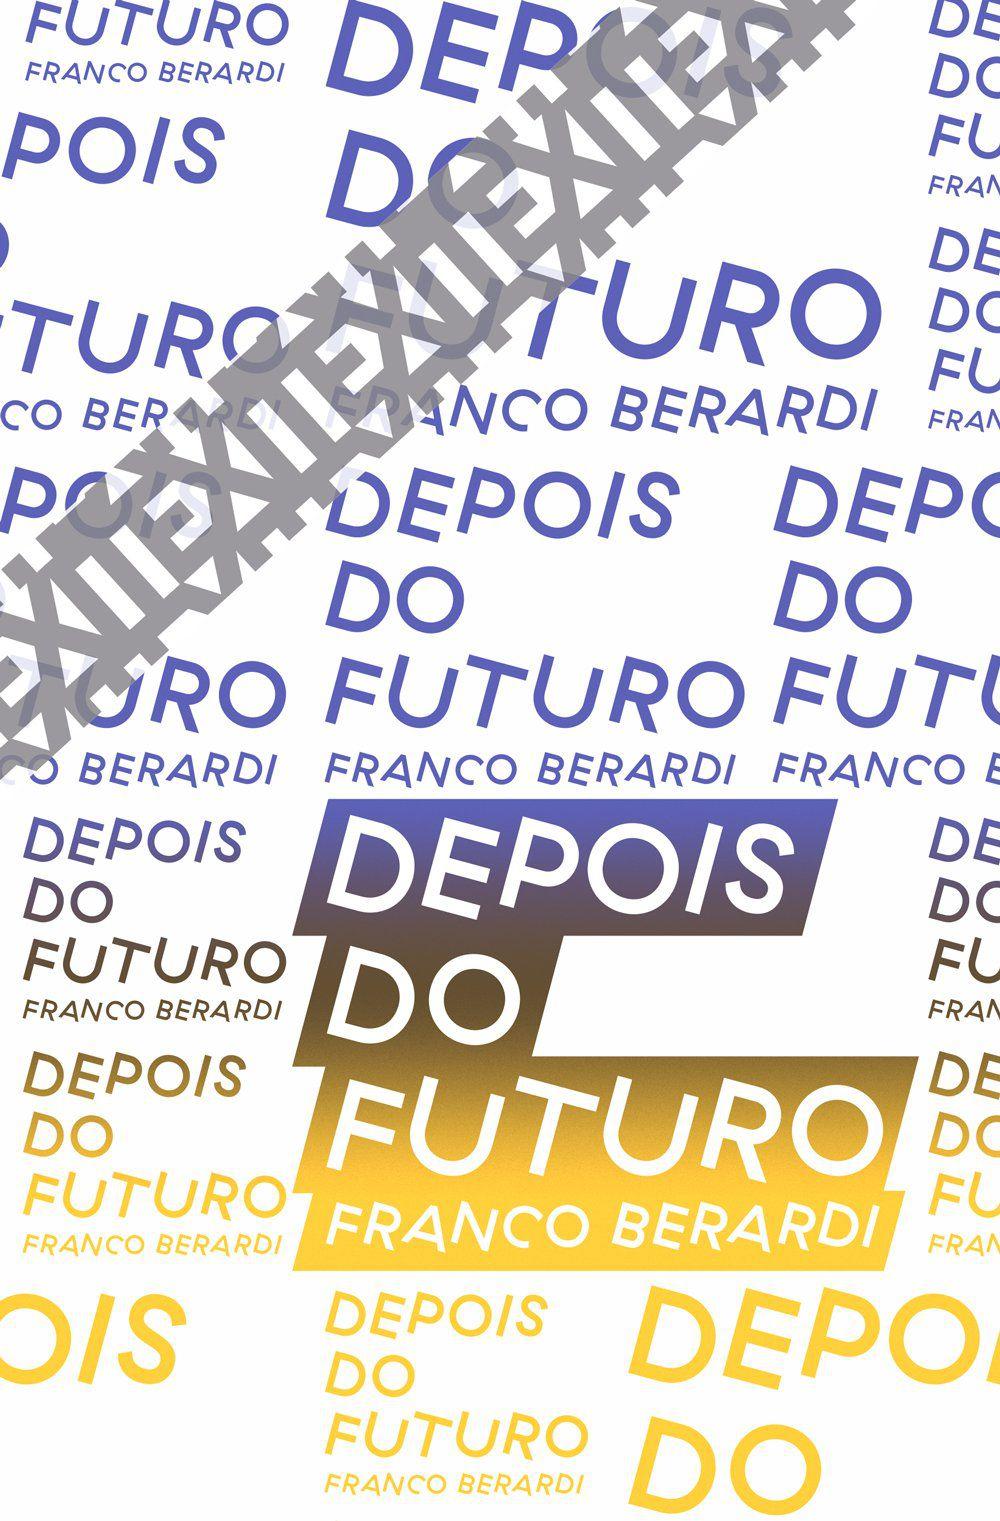 Depois do Futuro